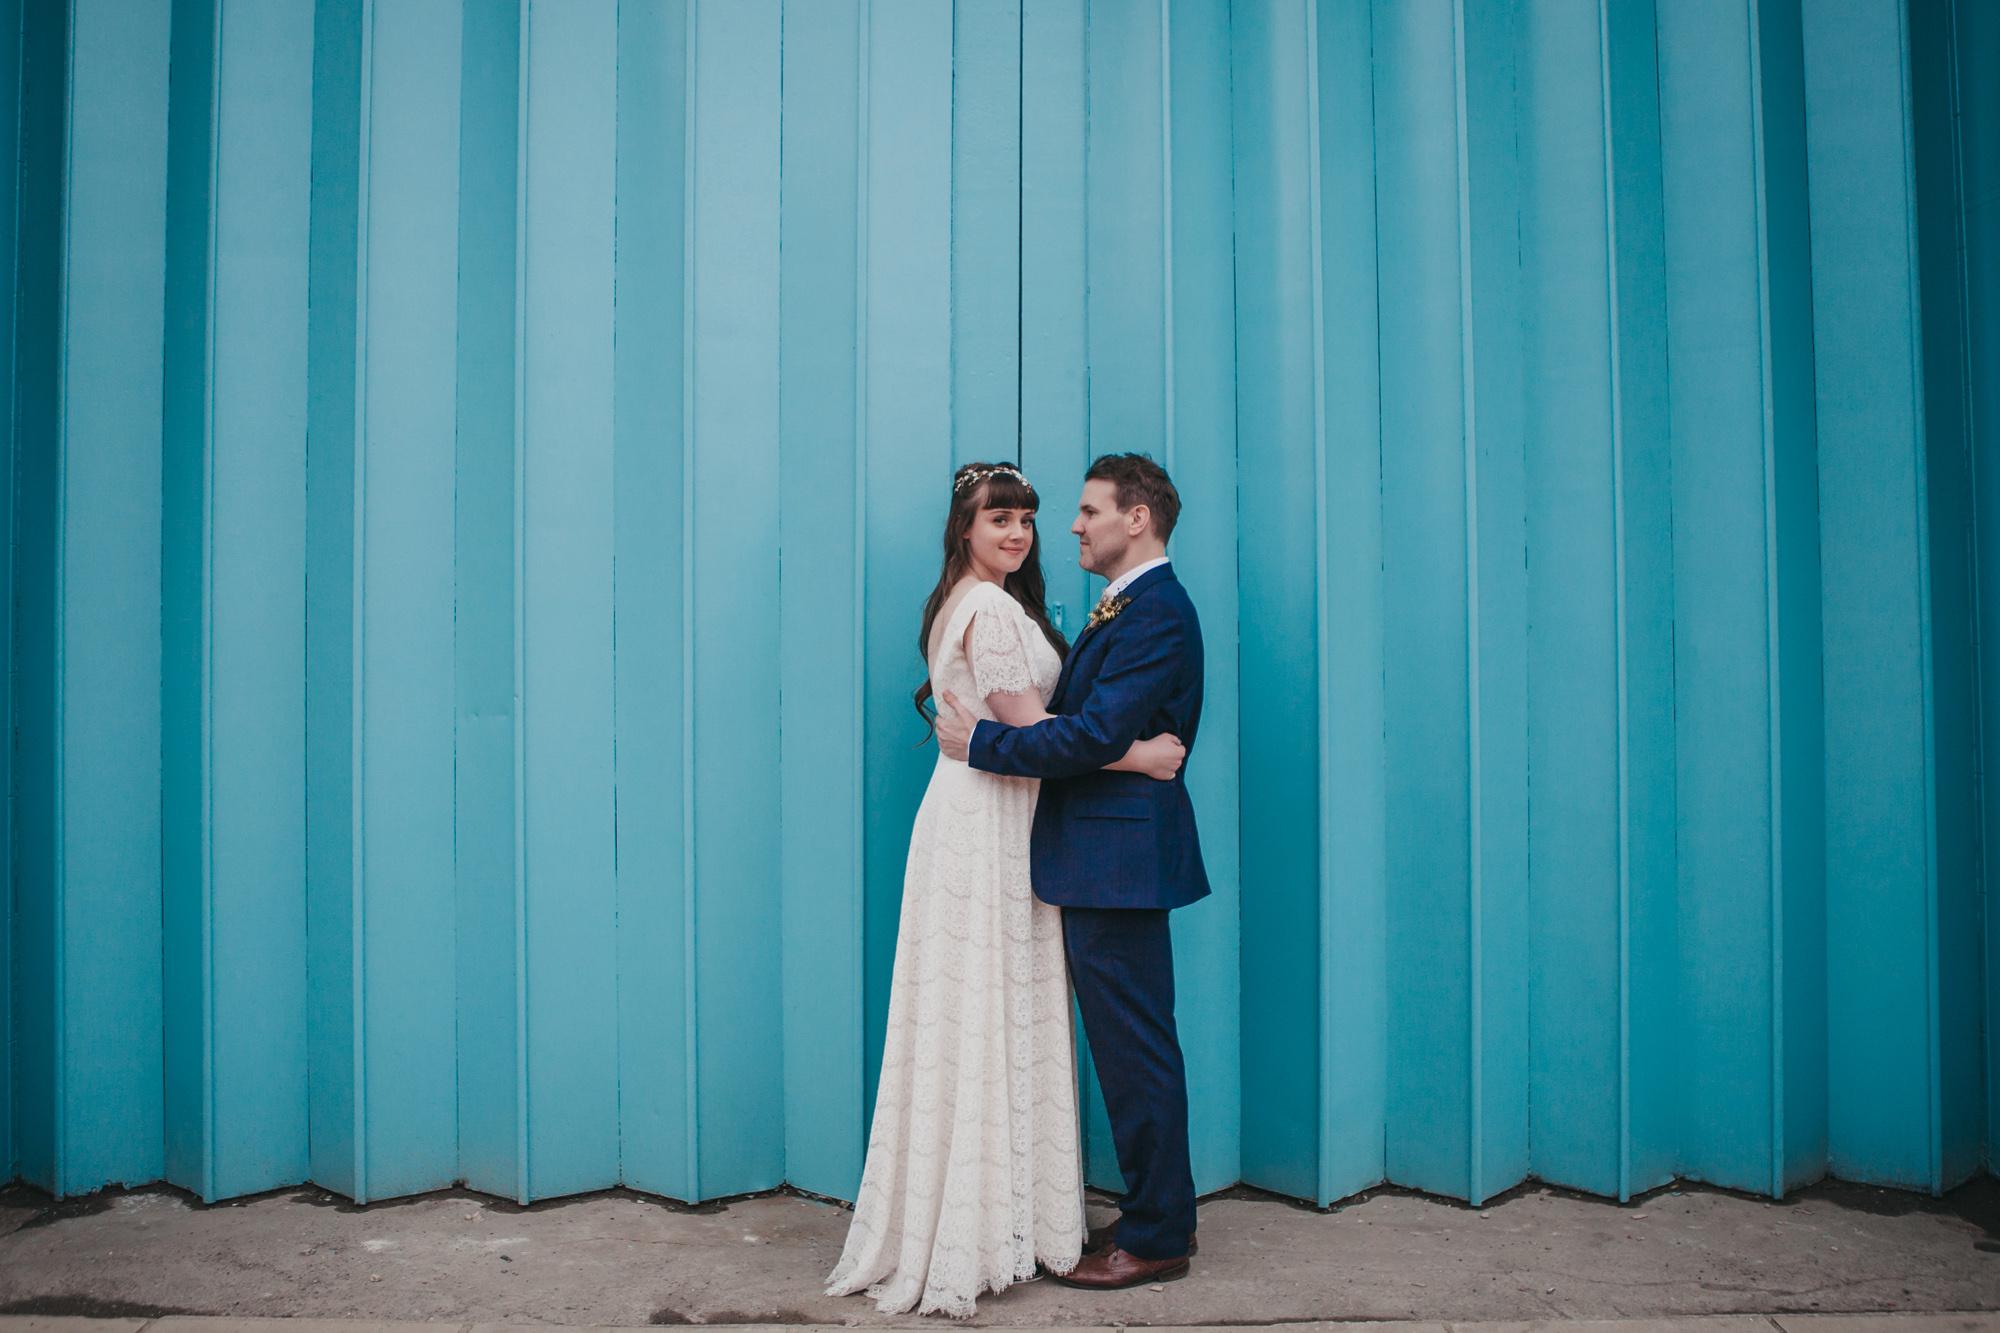 Kristy-Back-Garden-Outdoor-Wedding-Sheffield-Industrial-Warehouse-Wedding-Bohemian-Kate-Beaumont-Dahlia-Dress-60.jpg